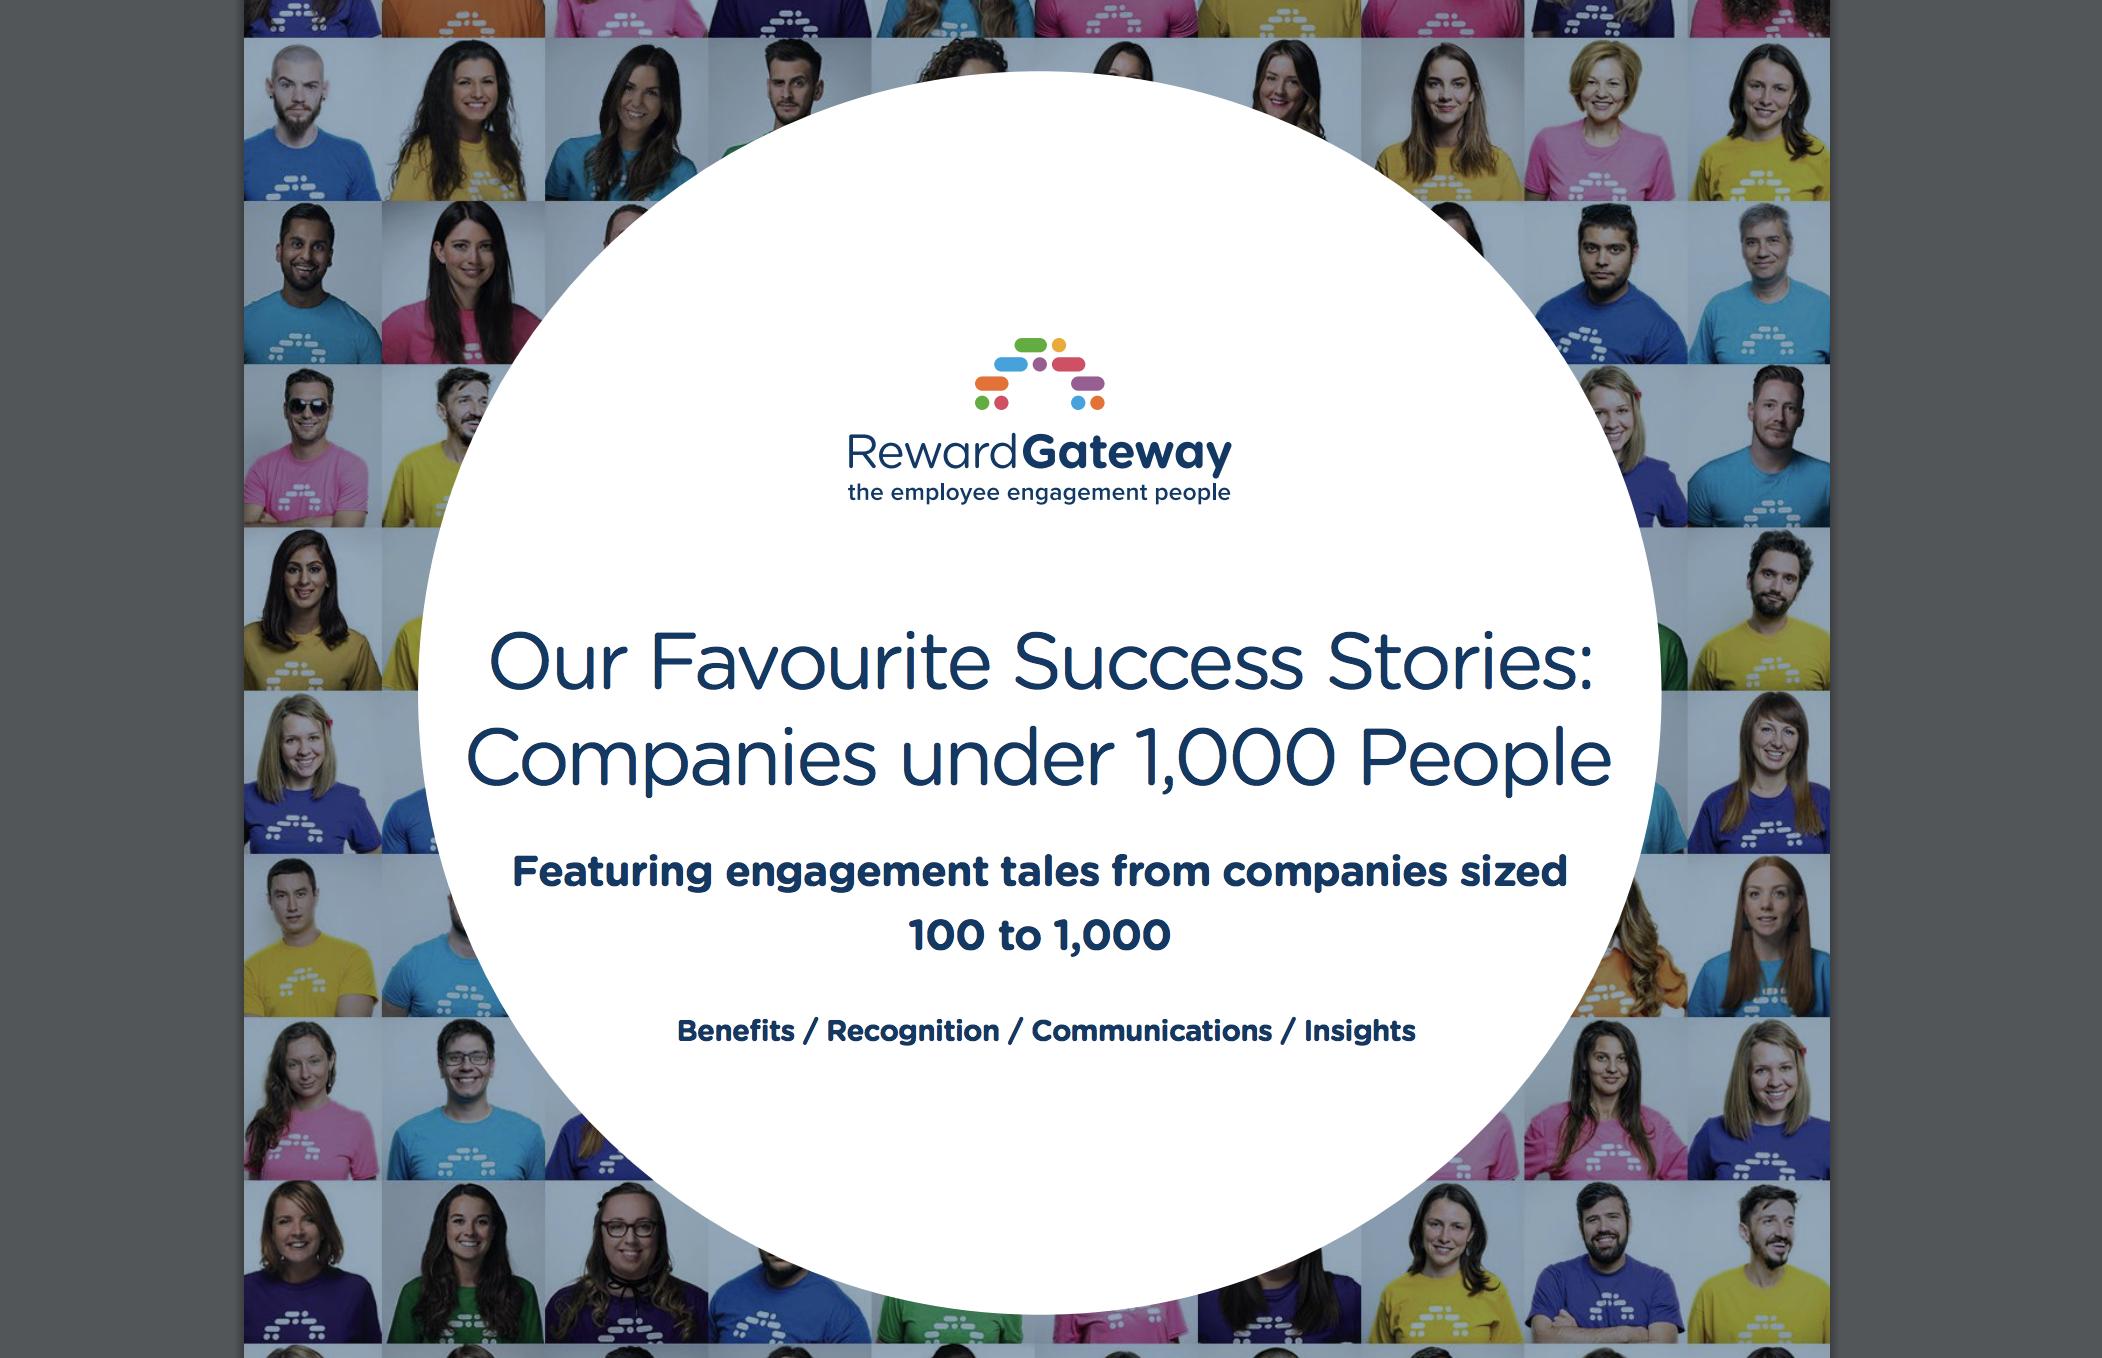 Employee engagement success stories